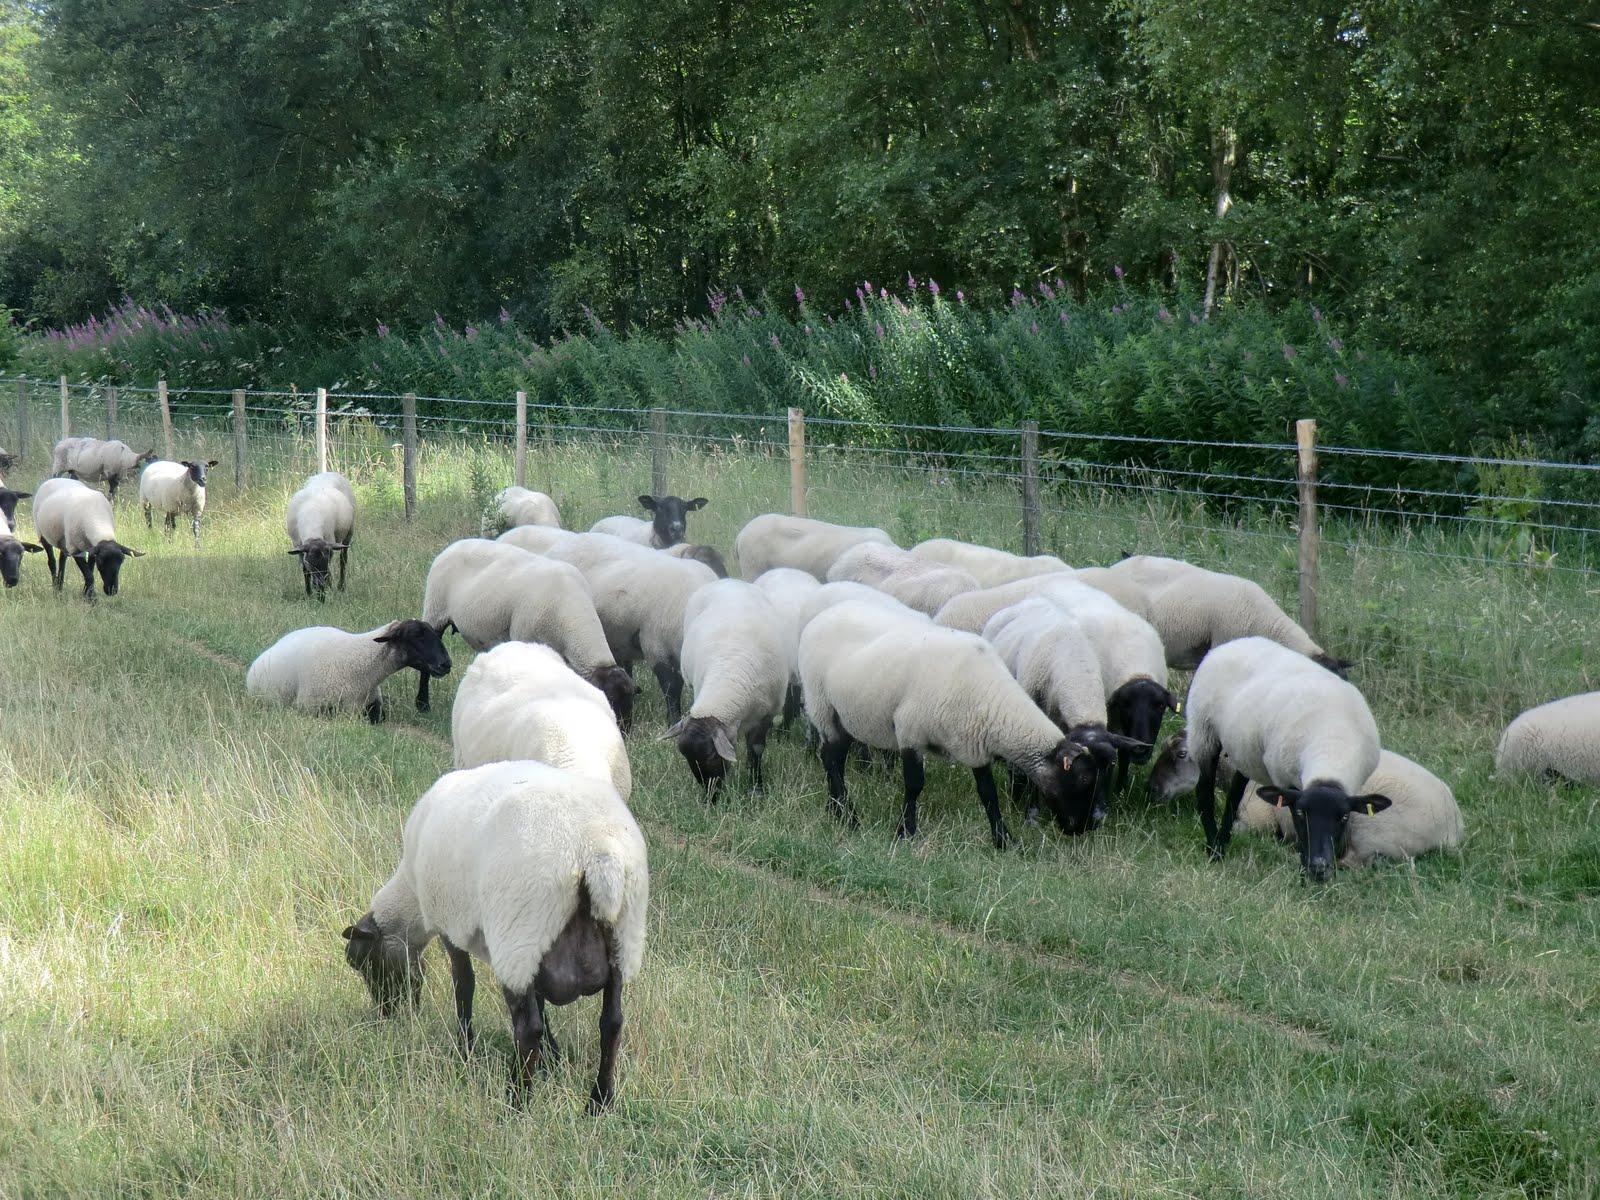 CIMG2932 Sheep on the Hucking Estate